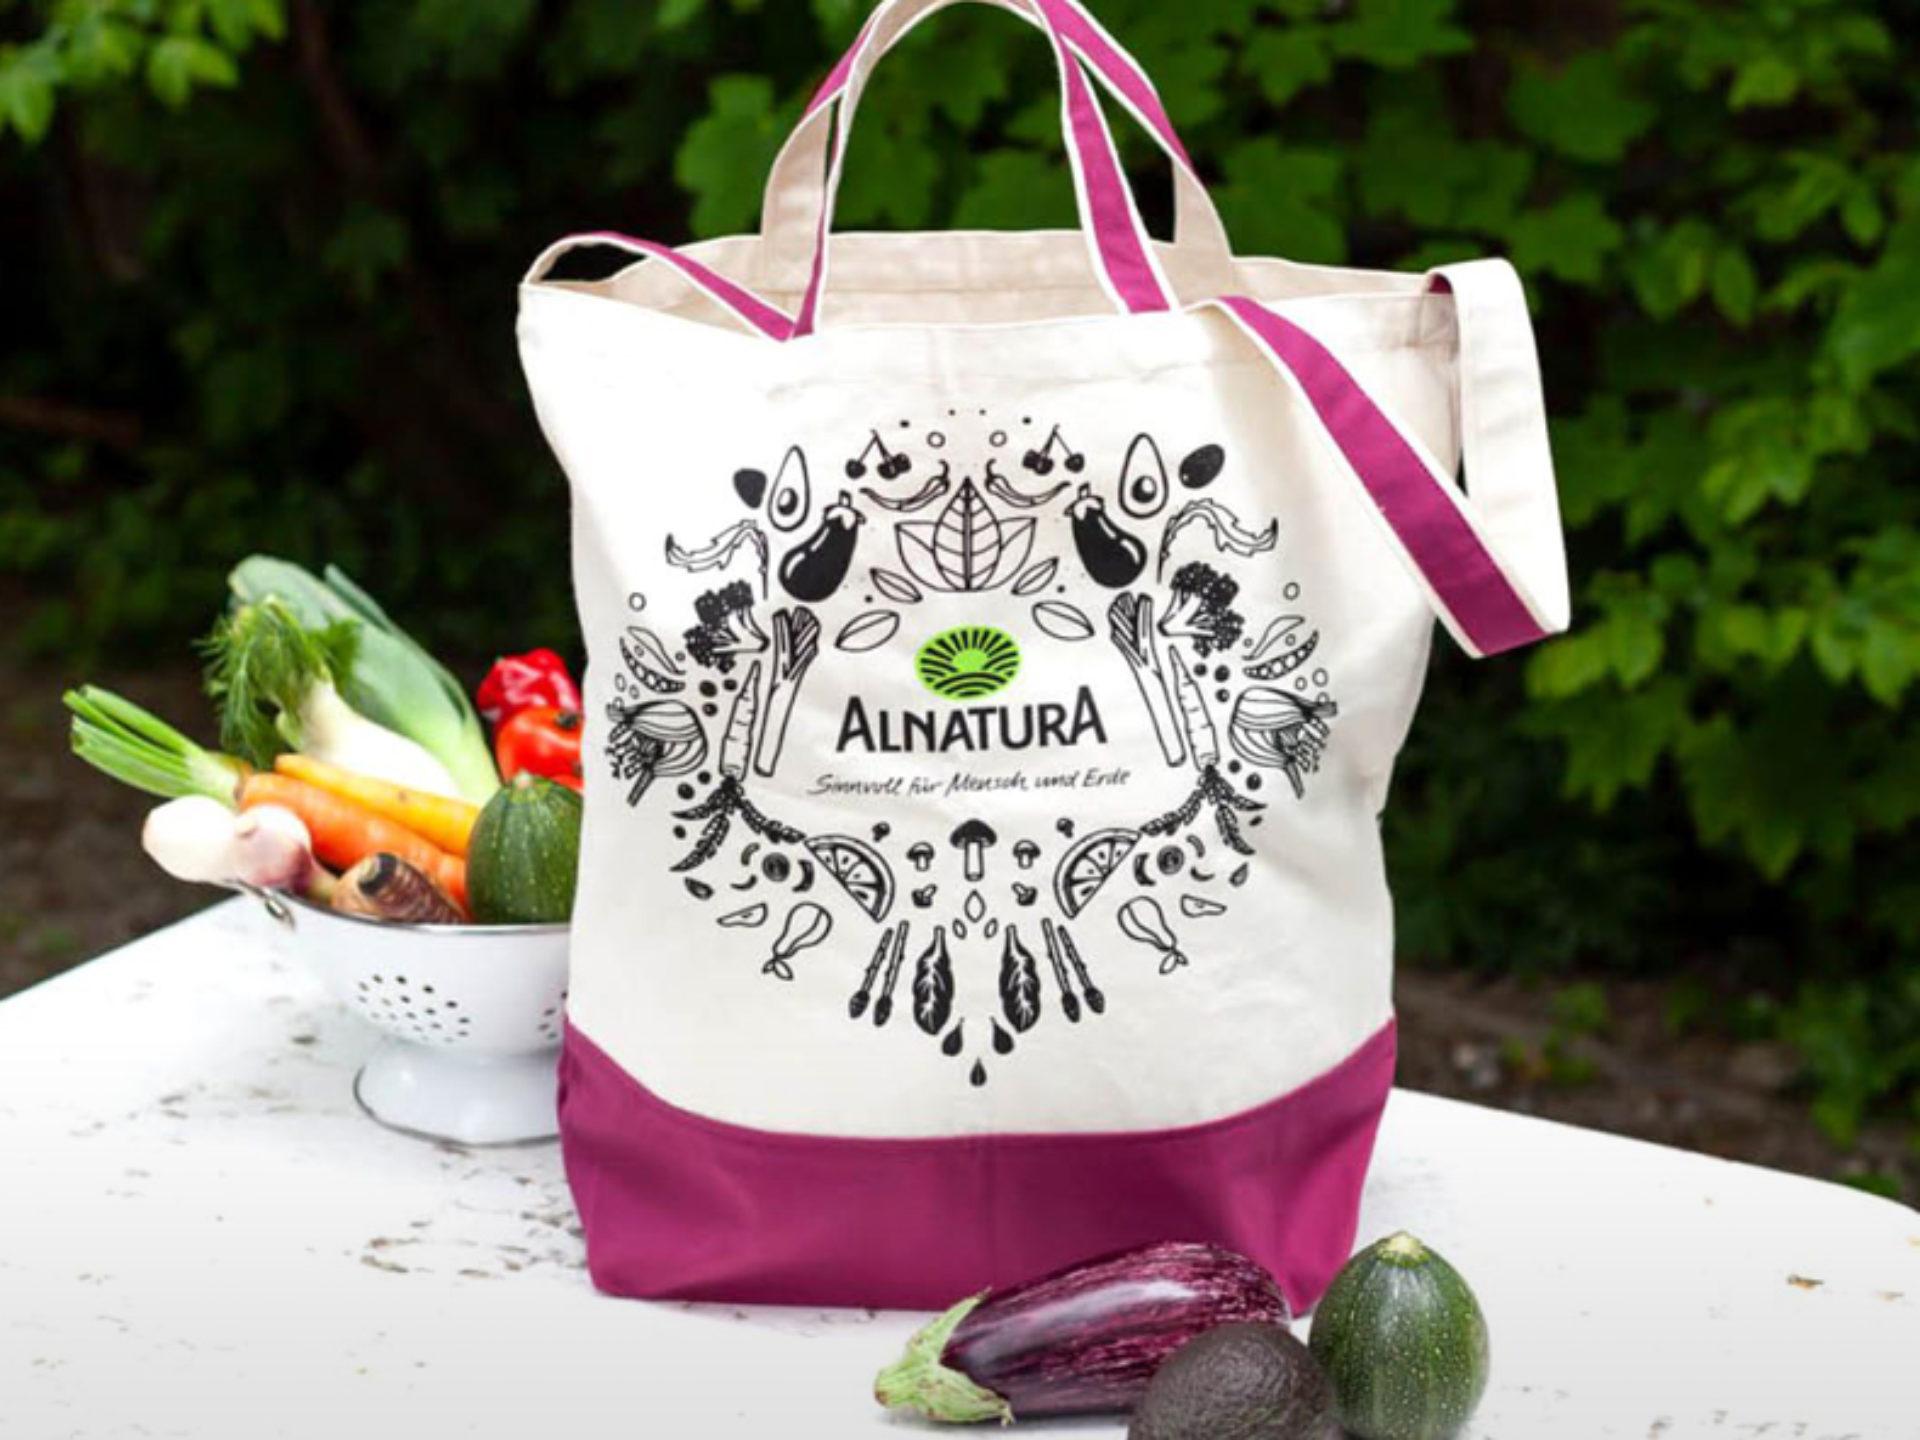 Newsblog Alnatura2019 Citybag